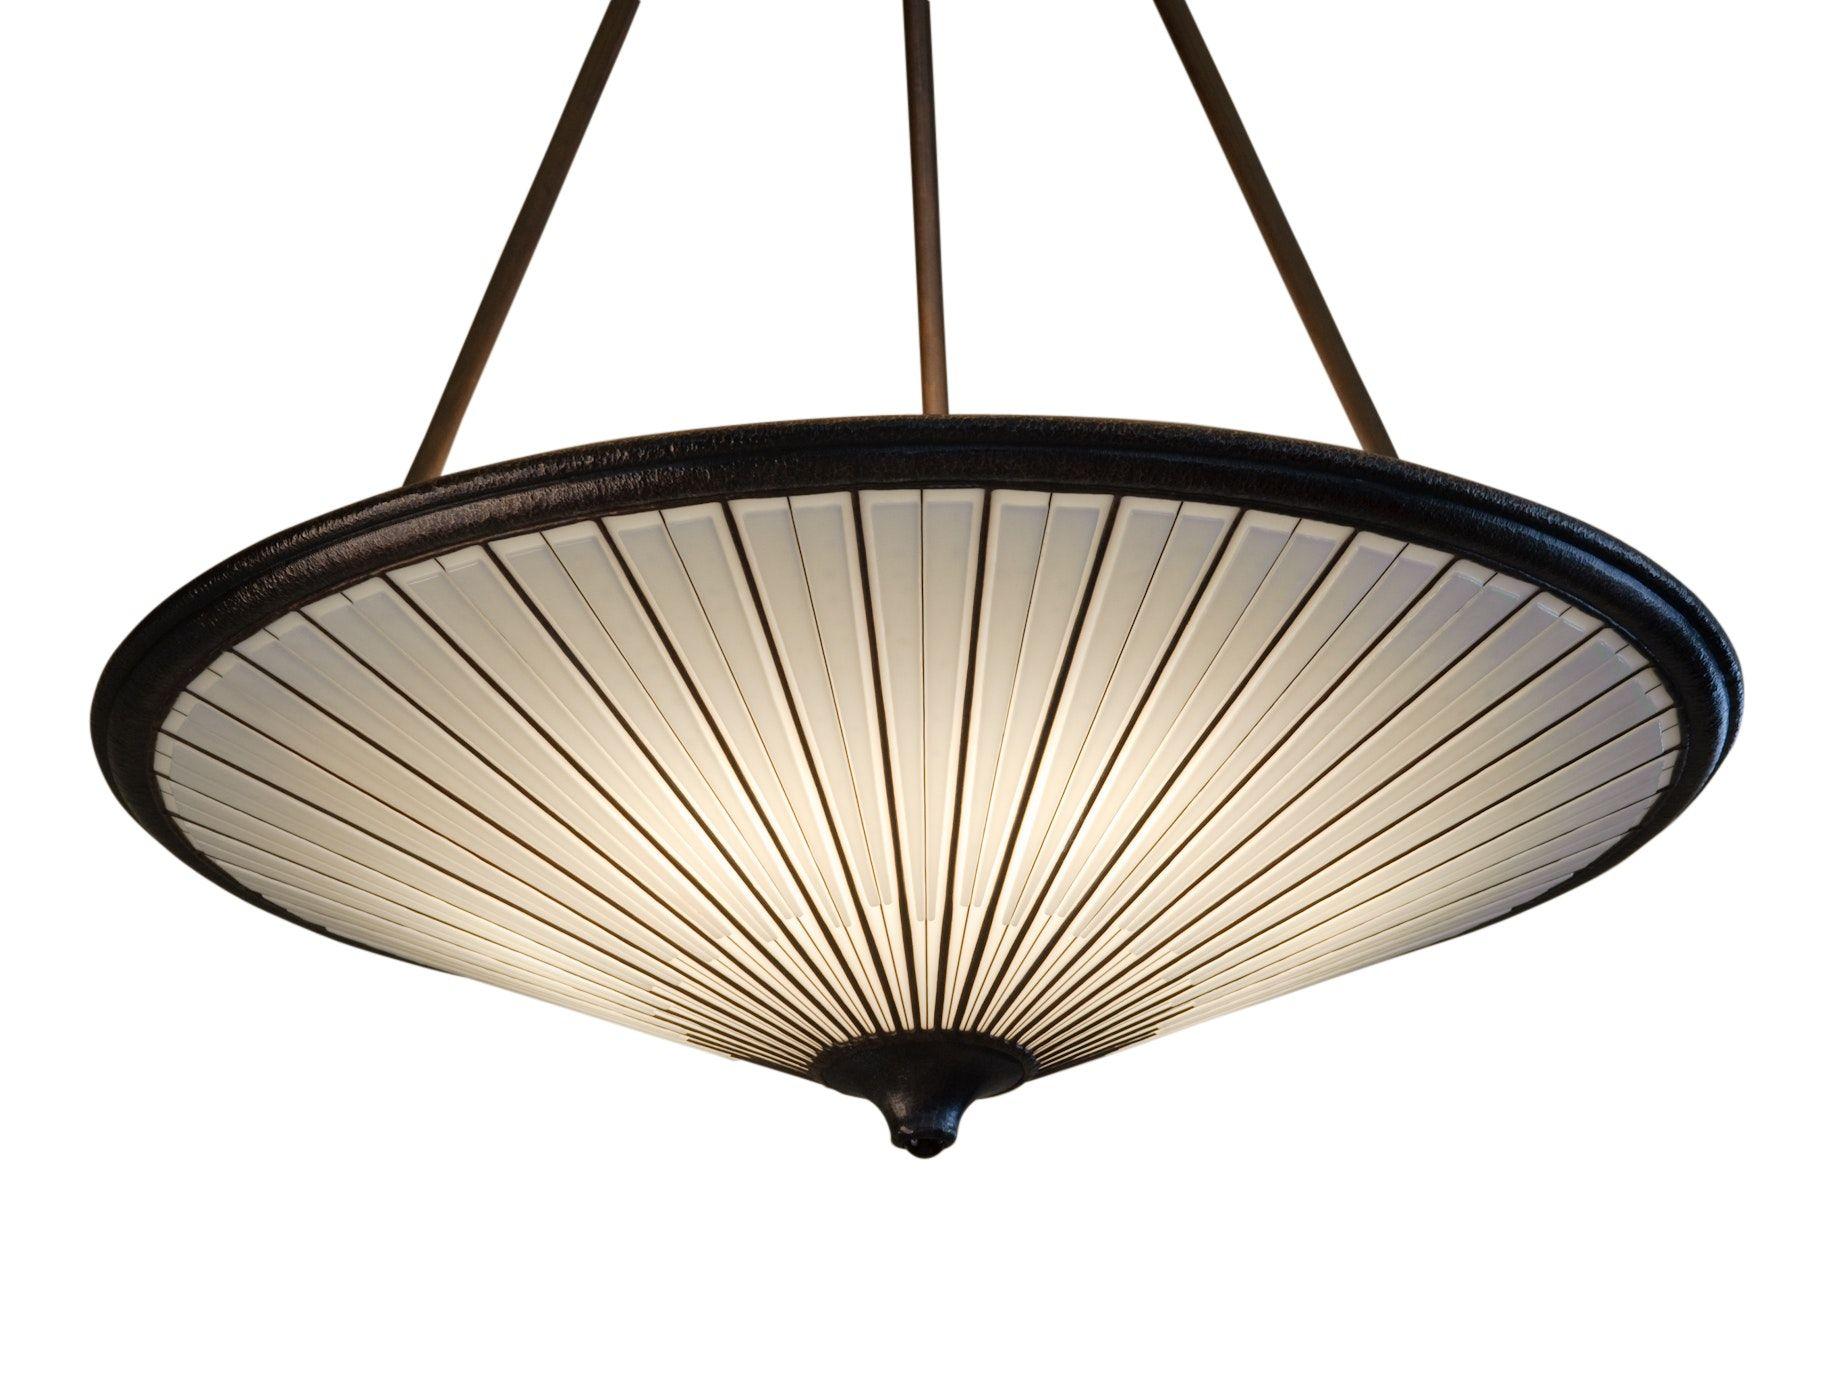 a6fadf25b5f3f1c6e31023b7c0394fe4 Meilleur De De Parasol Design Concept